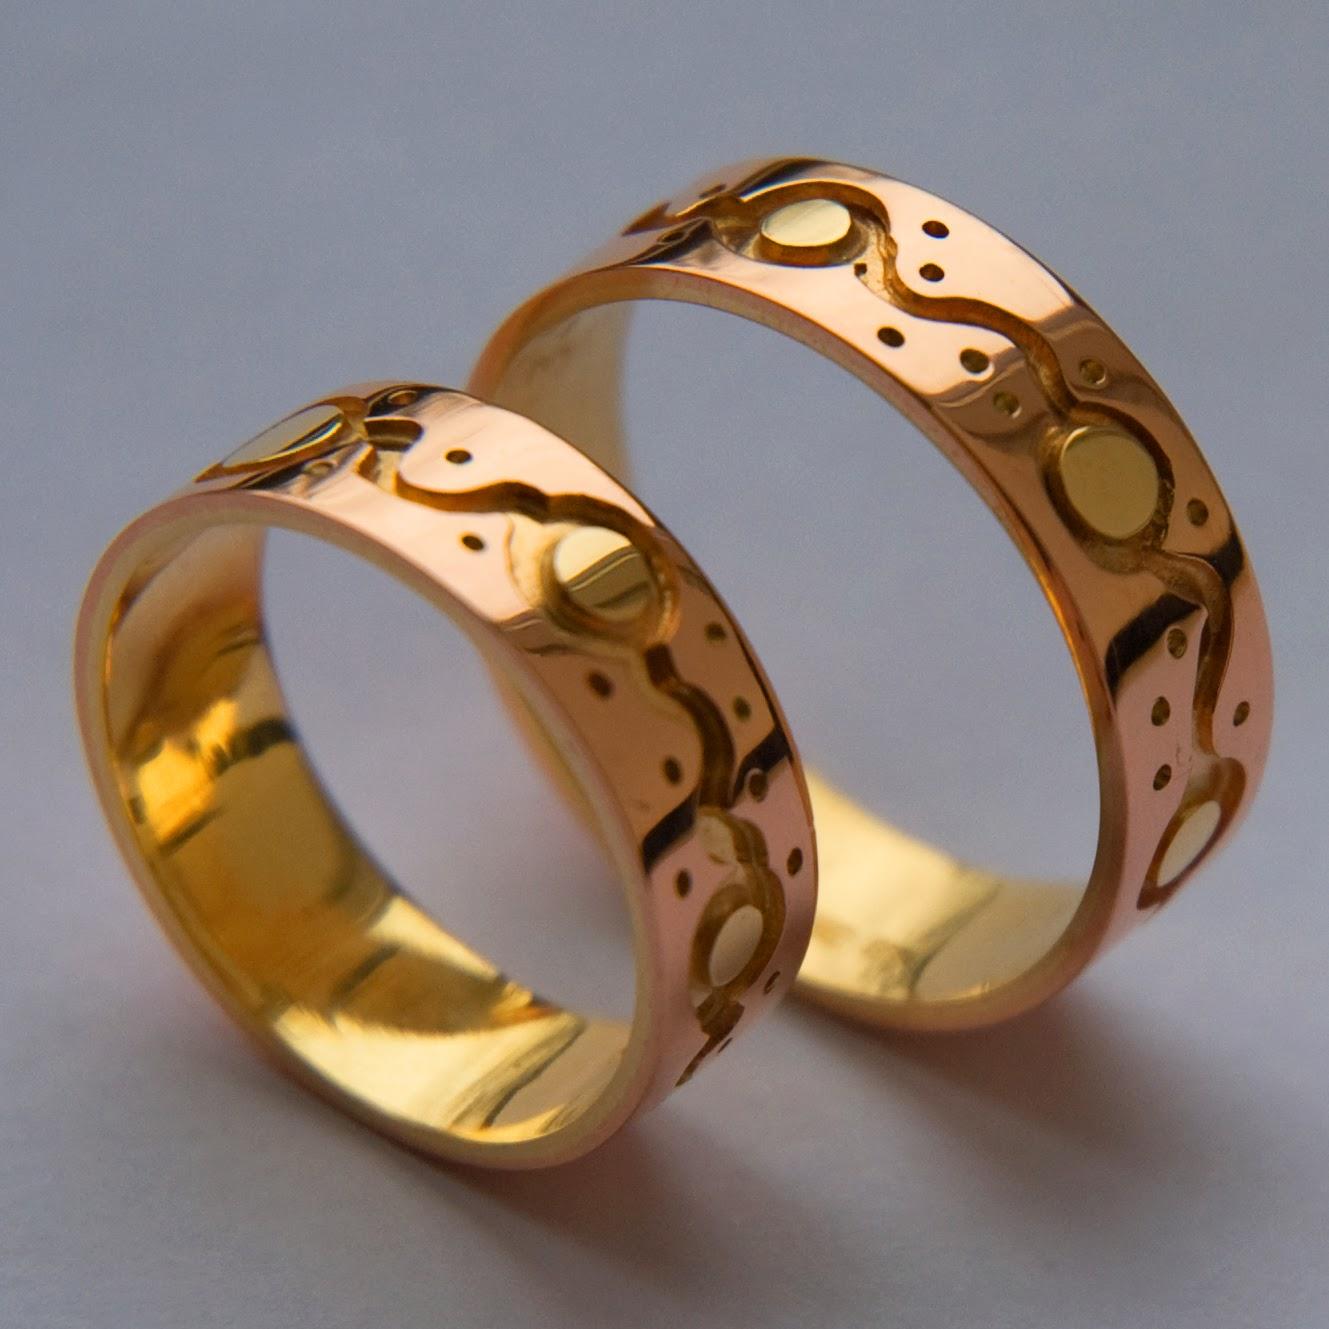 Ojibwe-style wedding rings Dancing Suns | Fisher Star Native ...